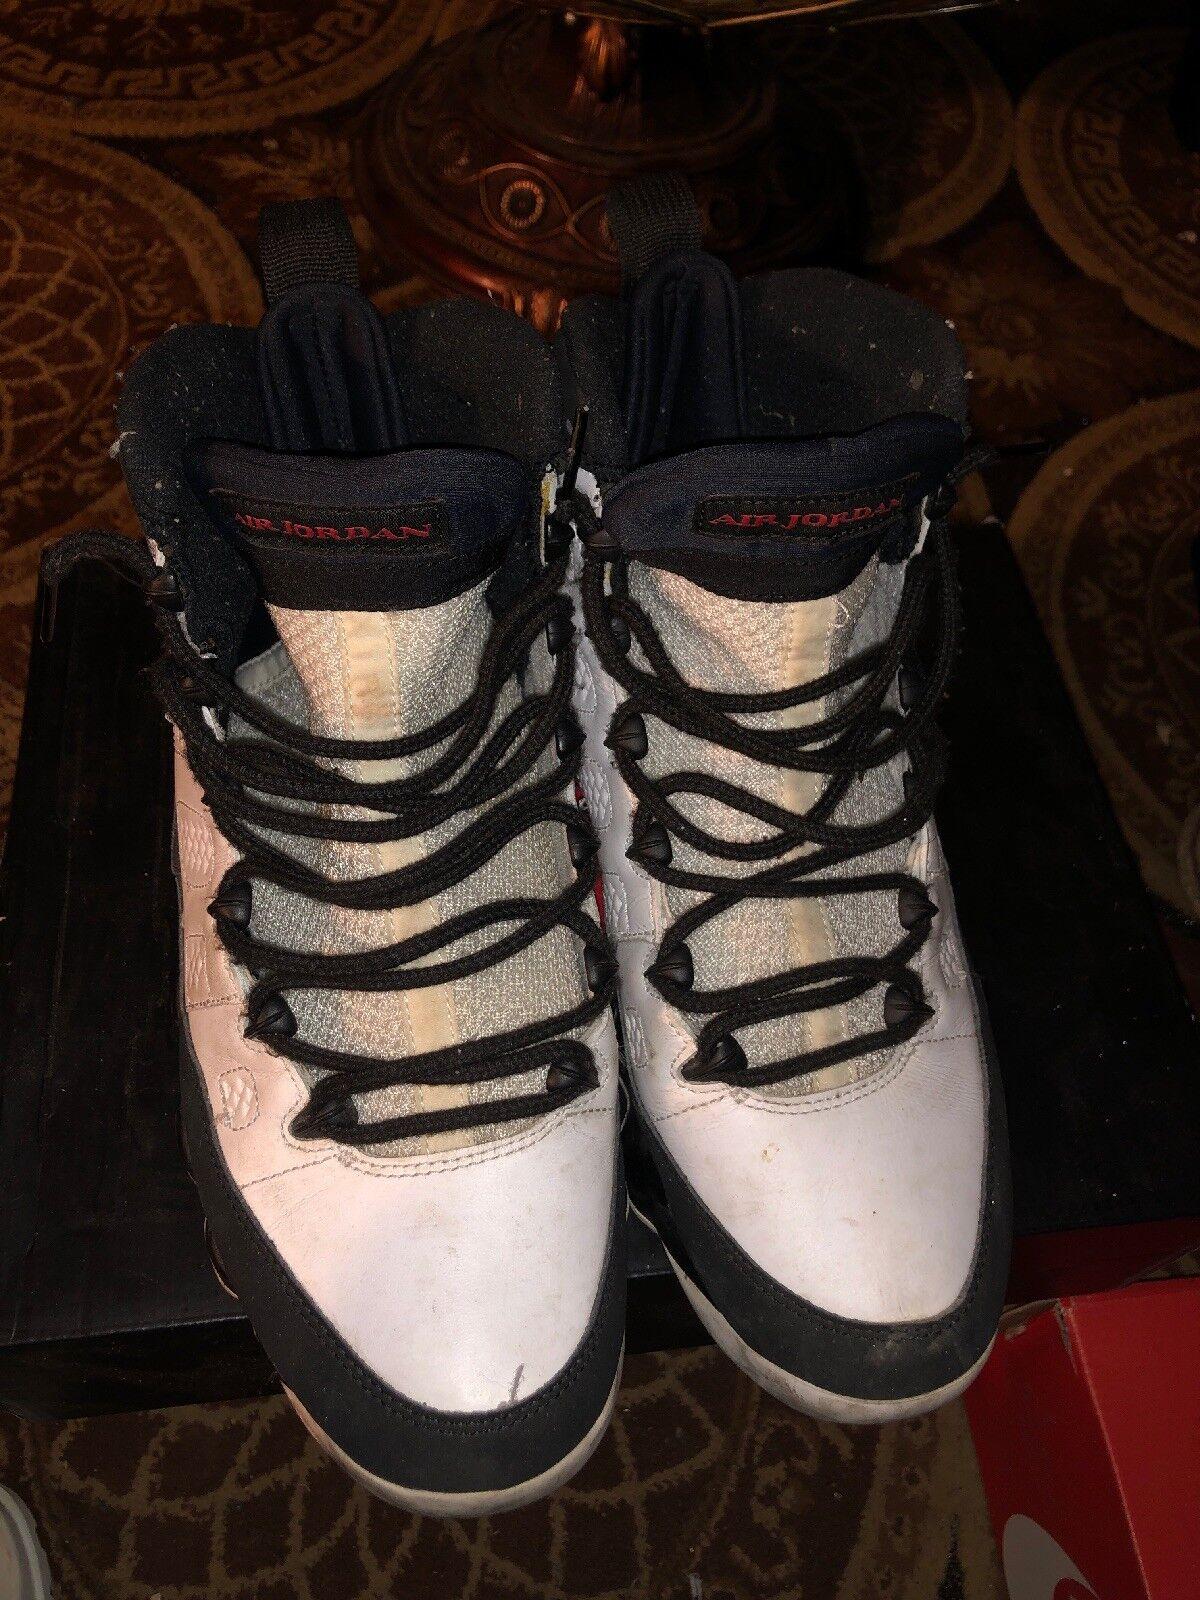 Jordans Retro 9s Jordan 9 Original  Air Jams  302370 Para hombres Baloncesto Space zapatos